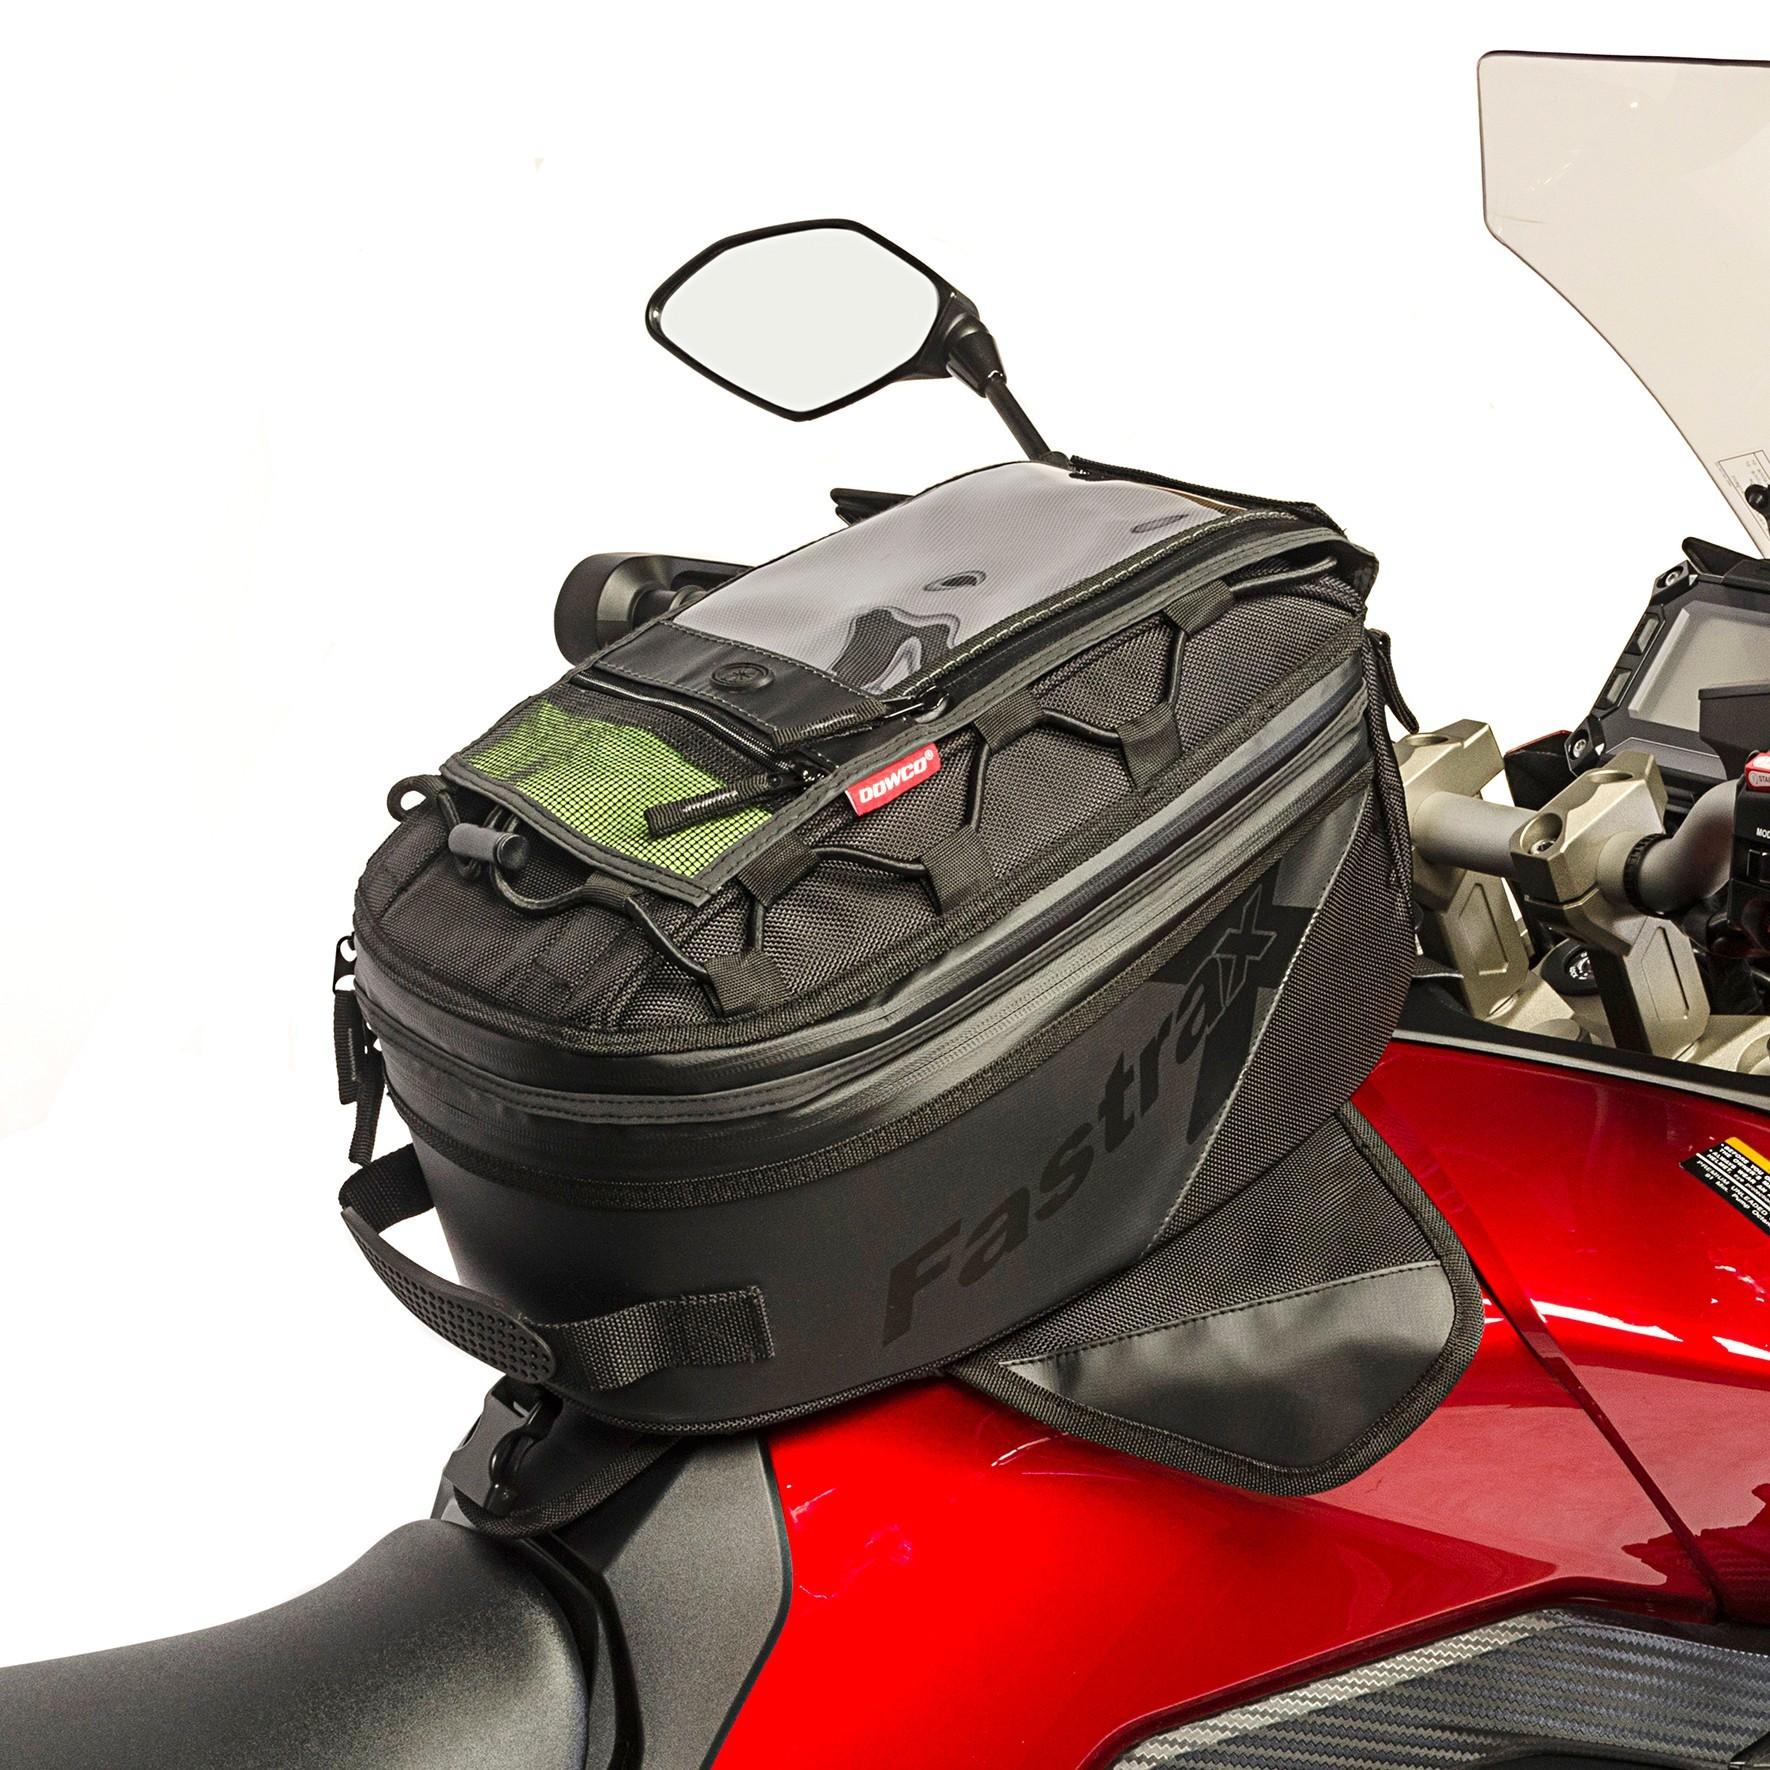 Dowco Fastrax Backroads Large Tank Bag on a Yamaha FJ-09 Motorcycle